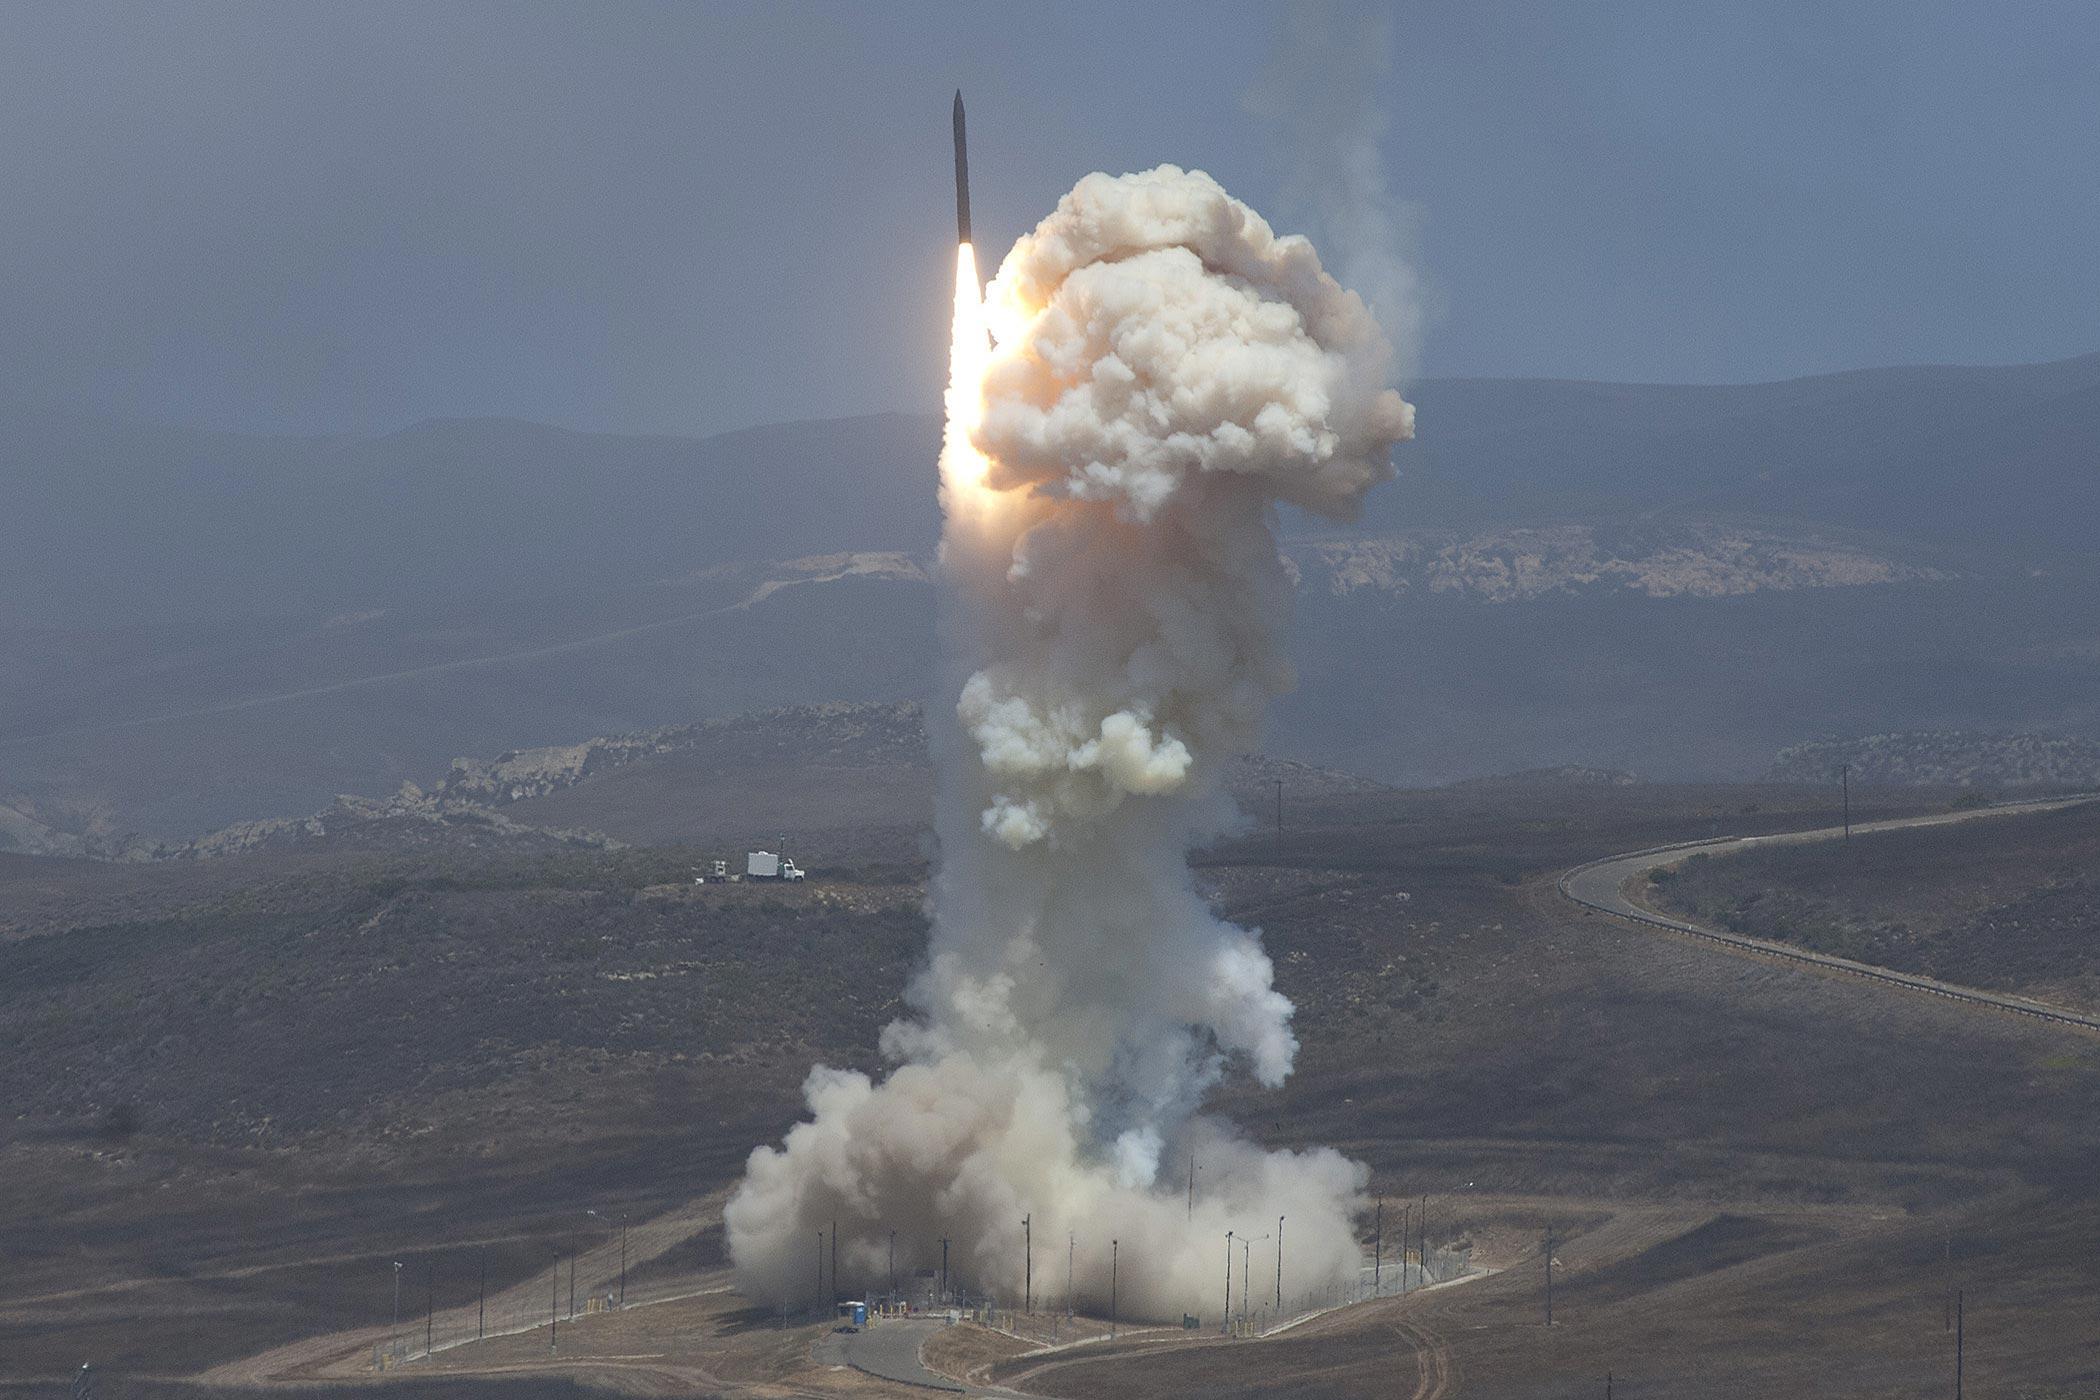 Colorado Troops in Spotlight After Successful Missile Intercept